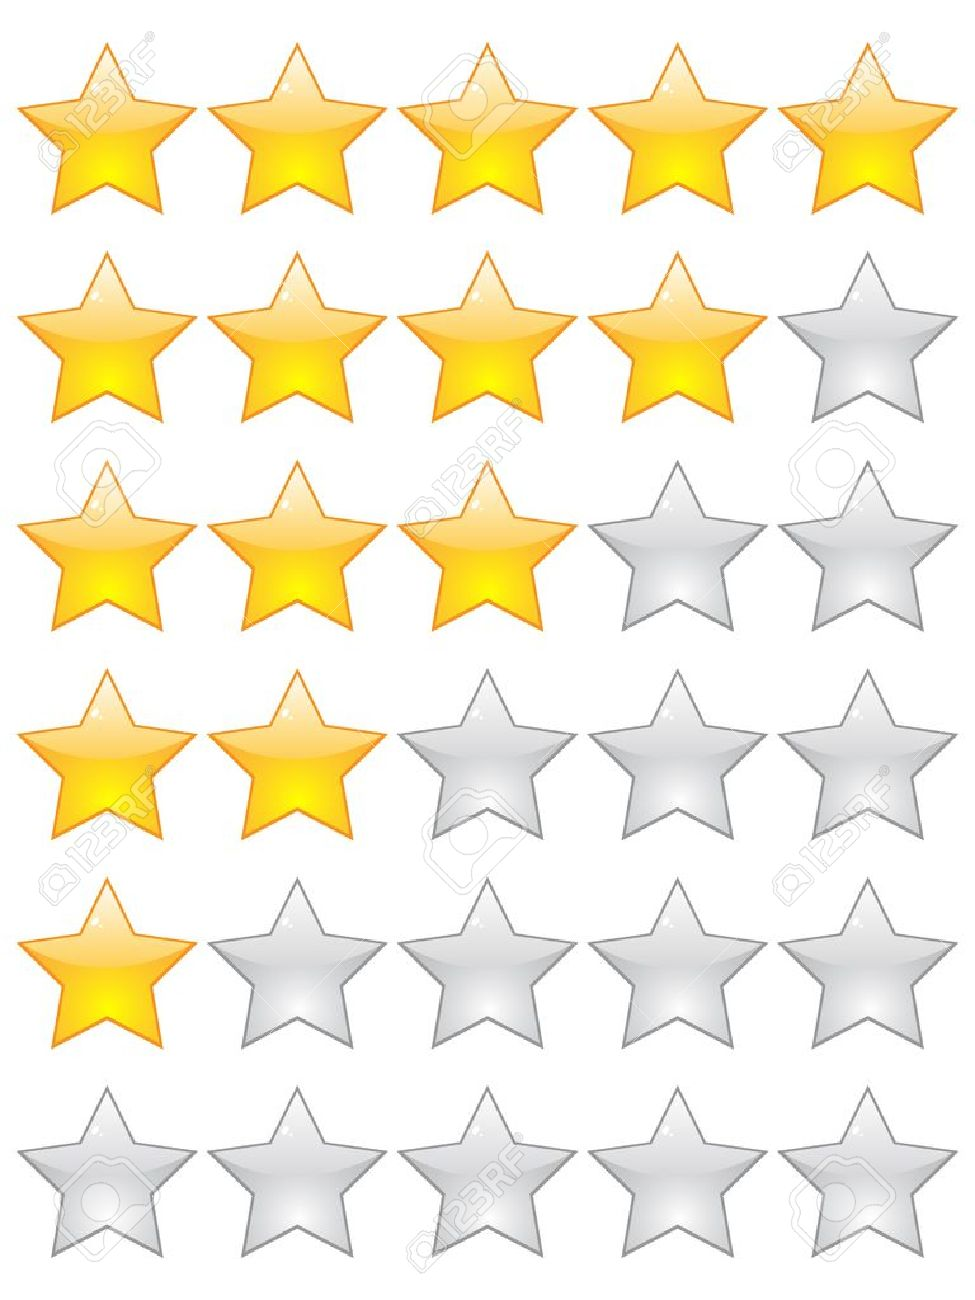 Hospital Star Ratings - A Game Changer? - Emerging Nurse Leader